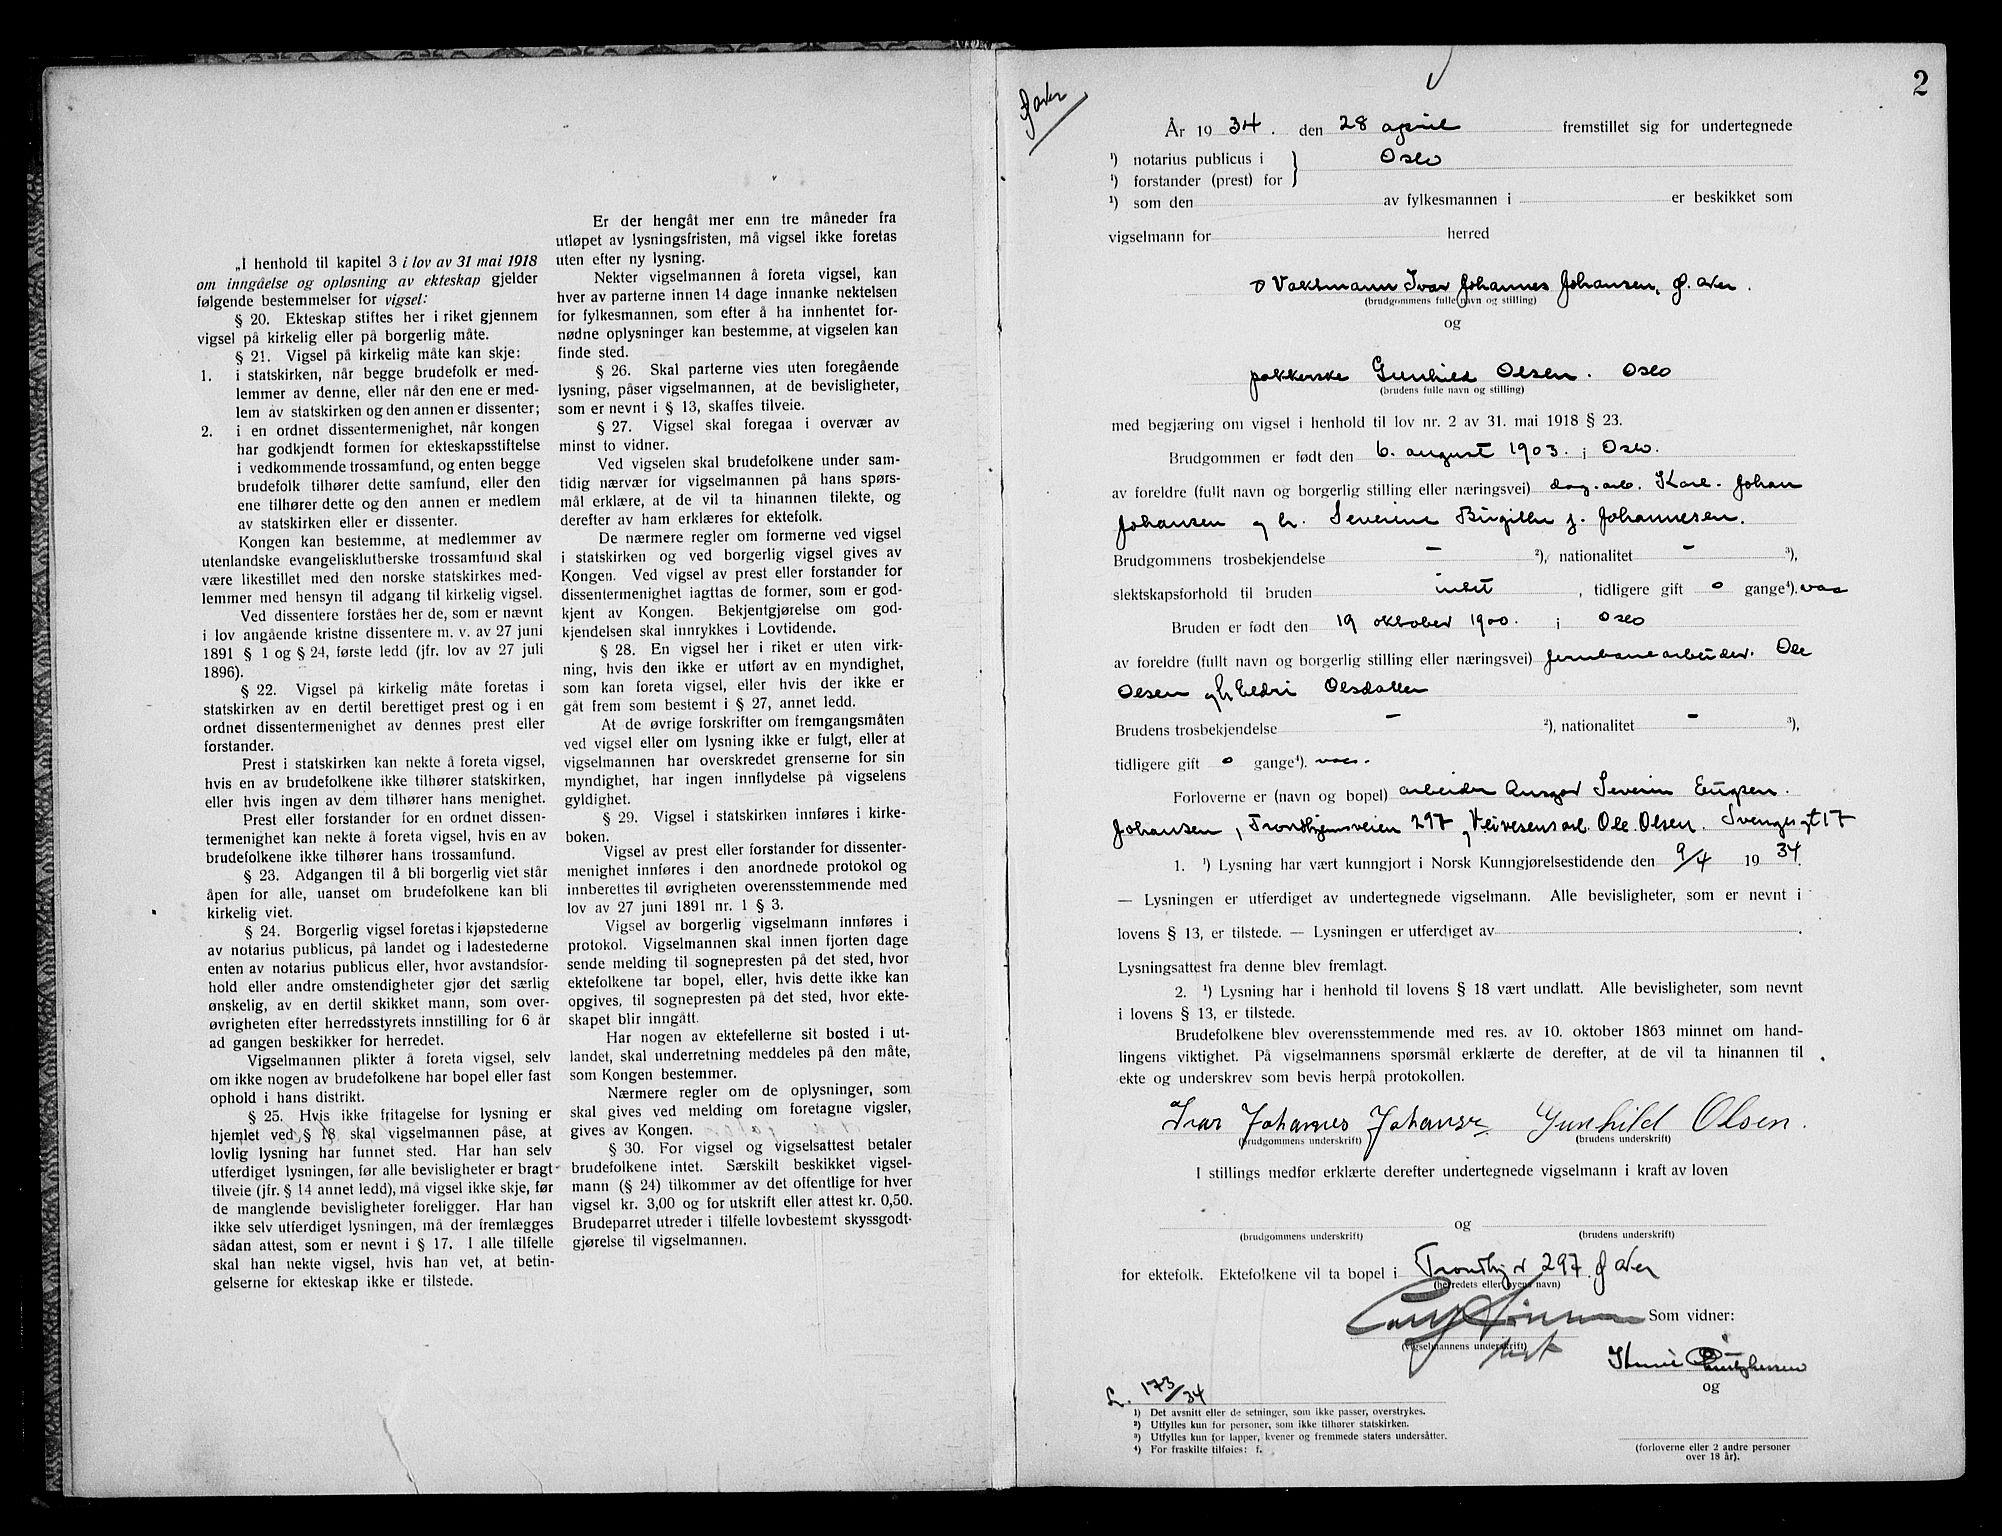 SAO, Oslo byfogd avd. I, L/Lb/Lbb/L0024: Notarialprotokoll, rekke II: Vigsler, 1934-1935, s. 1b-2a